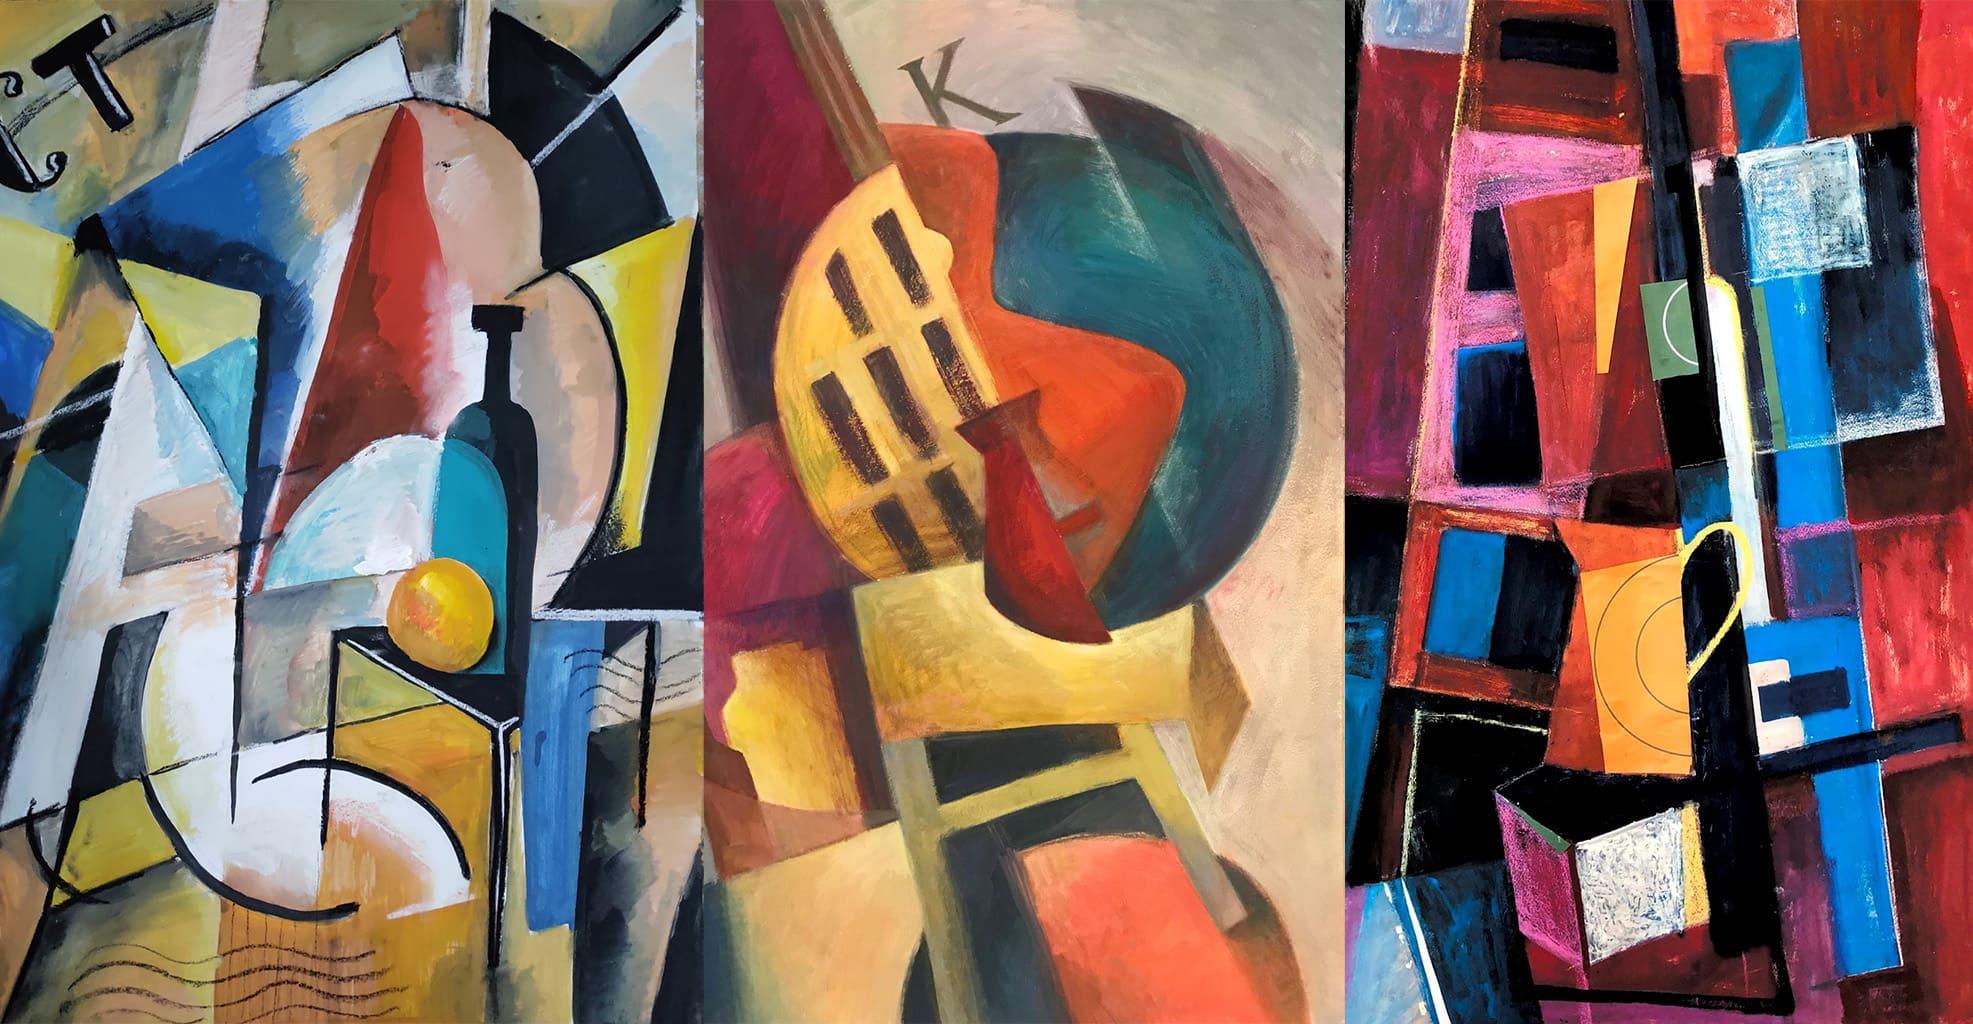 Intercollegiate competition in painting